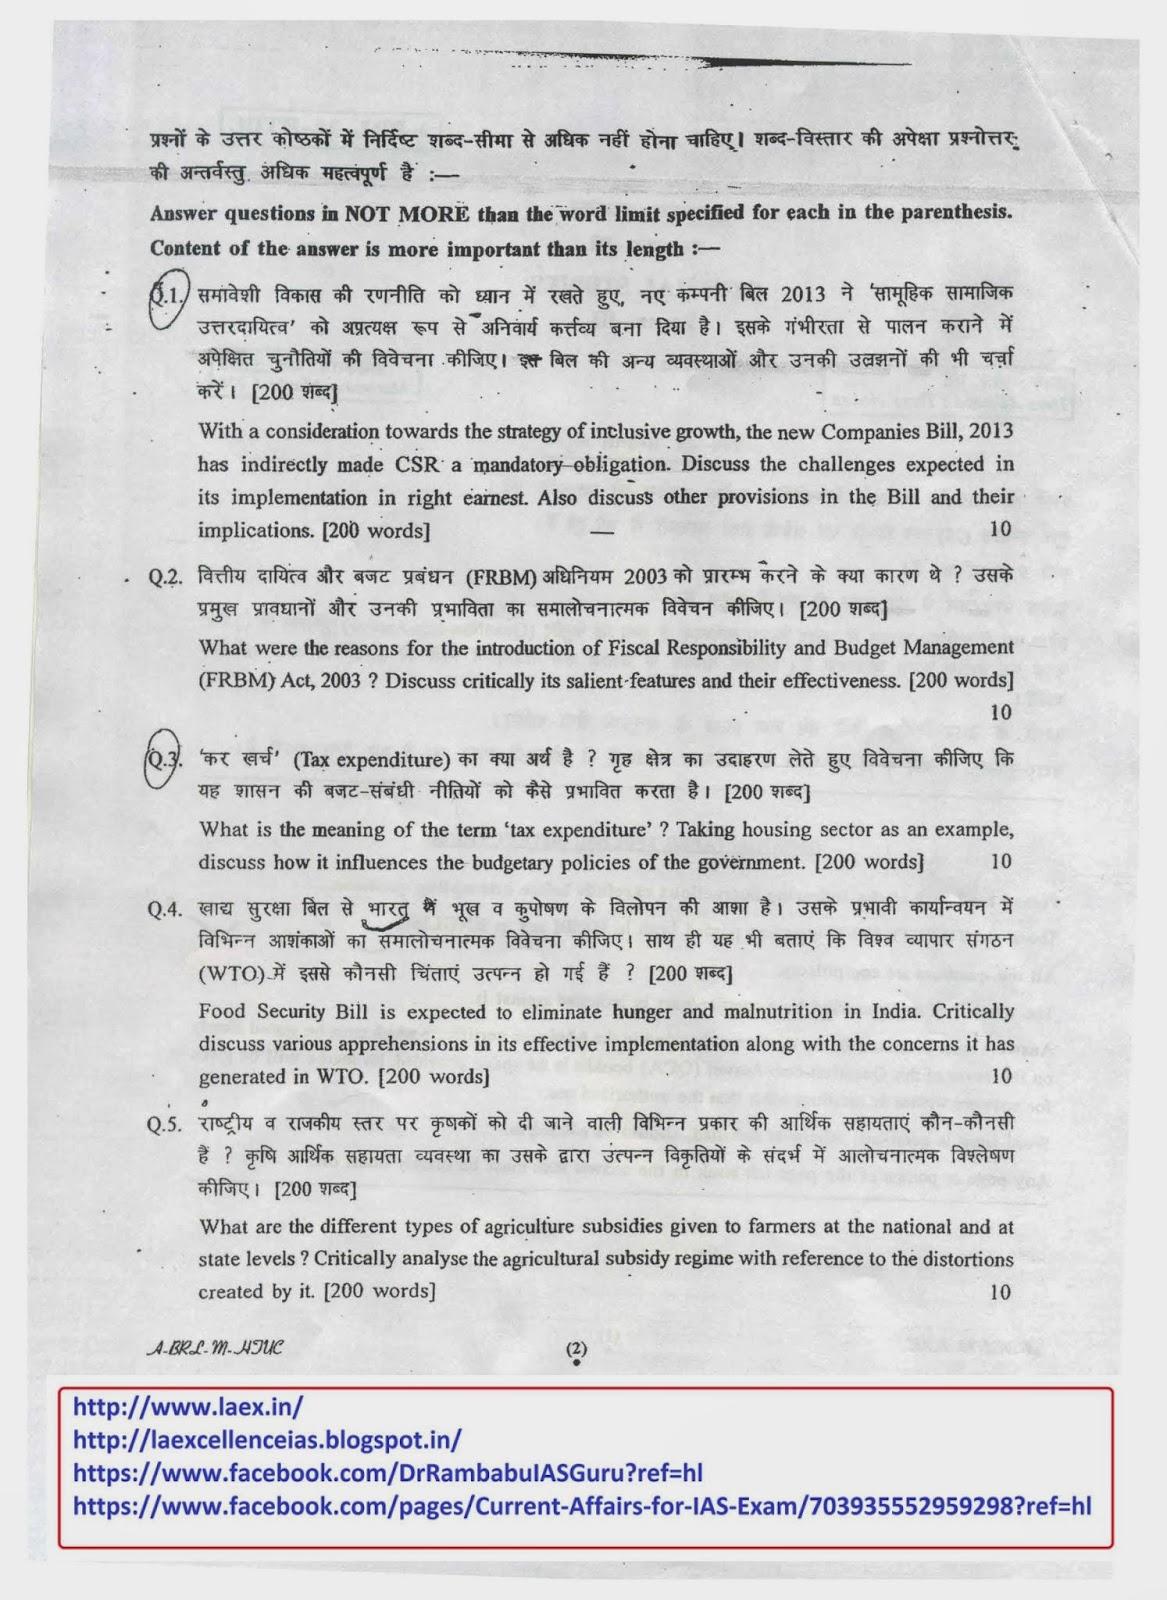 civil services mains 2013 essay paper 2016-8-20 upsc 2013 essay topics, upsc mains essay paper essays for civil services, general upsc 2013 essay topics on current topics, suggested essays.